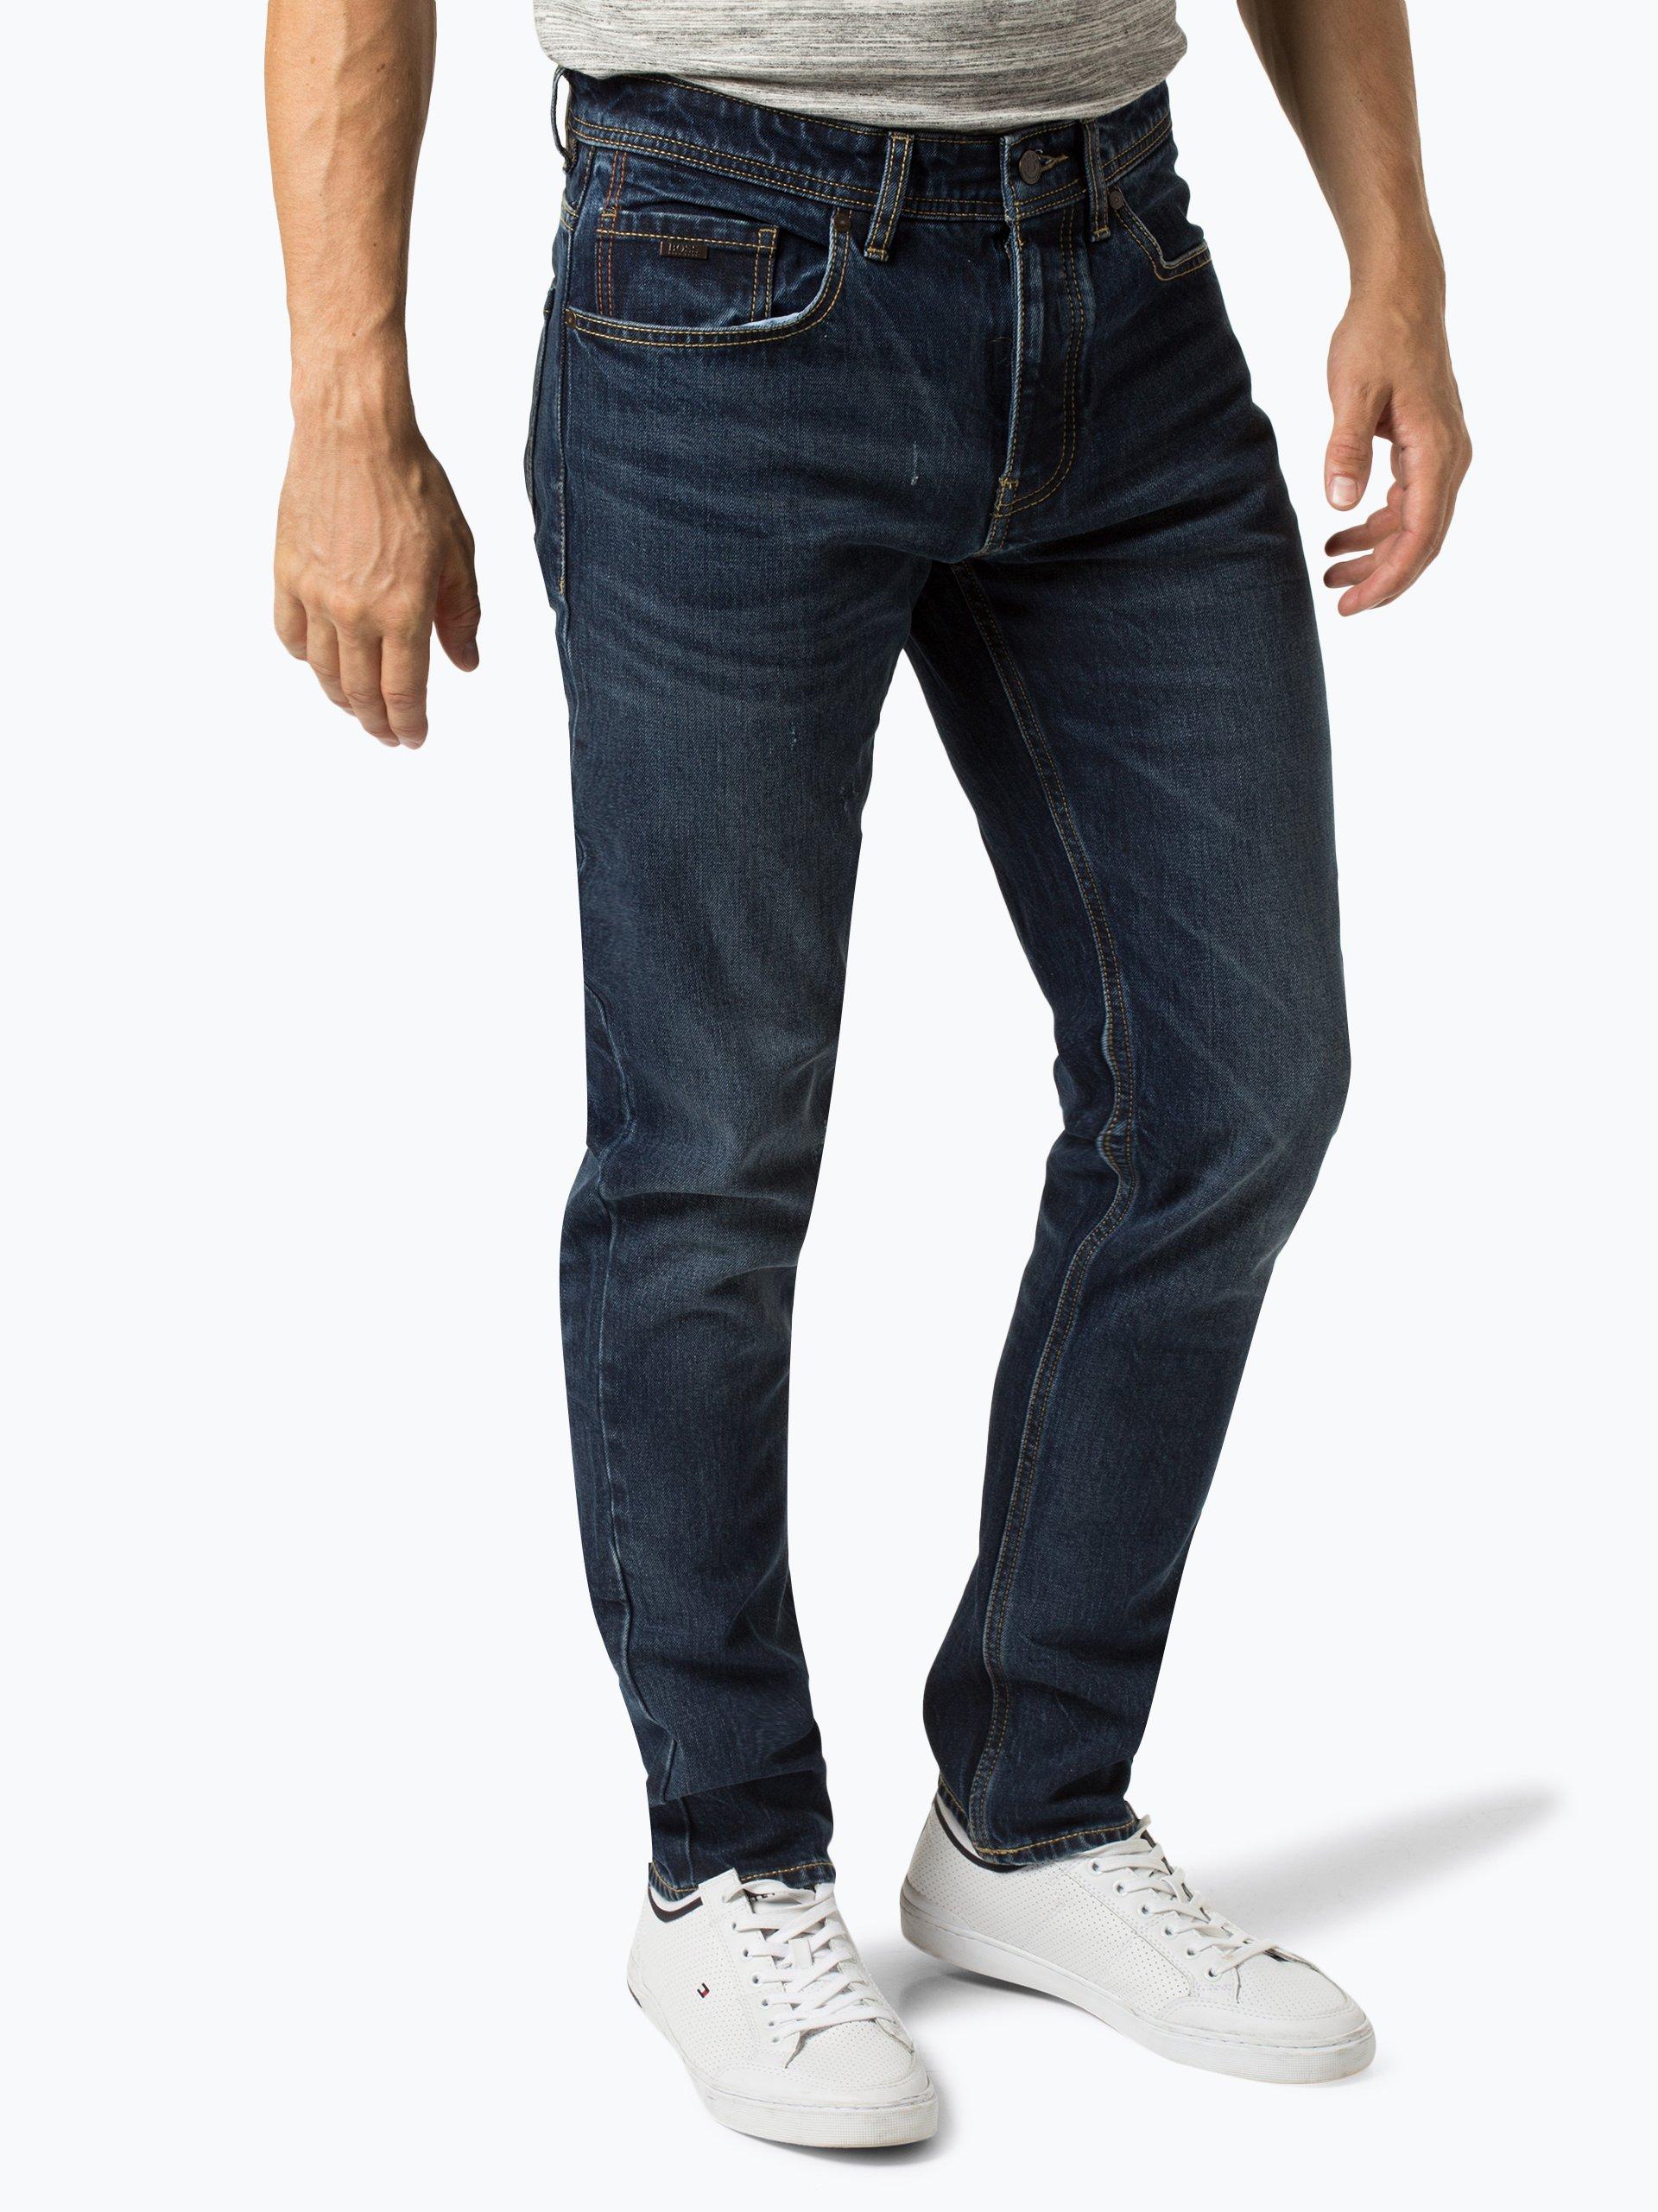 BOSS Casual Herren Jeans - 040 Taber